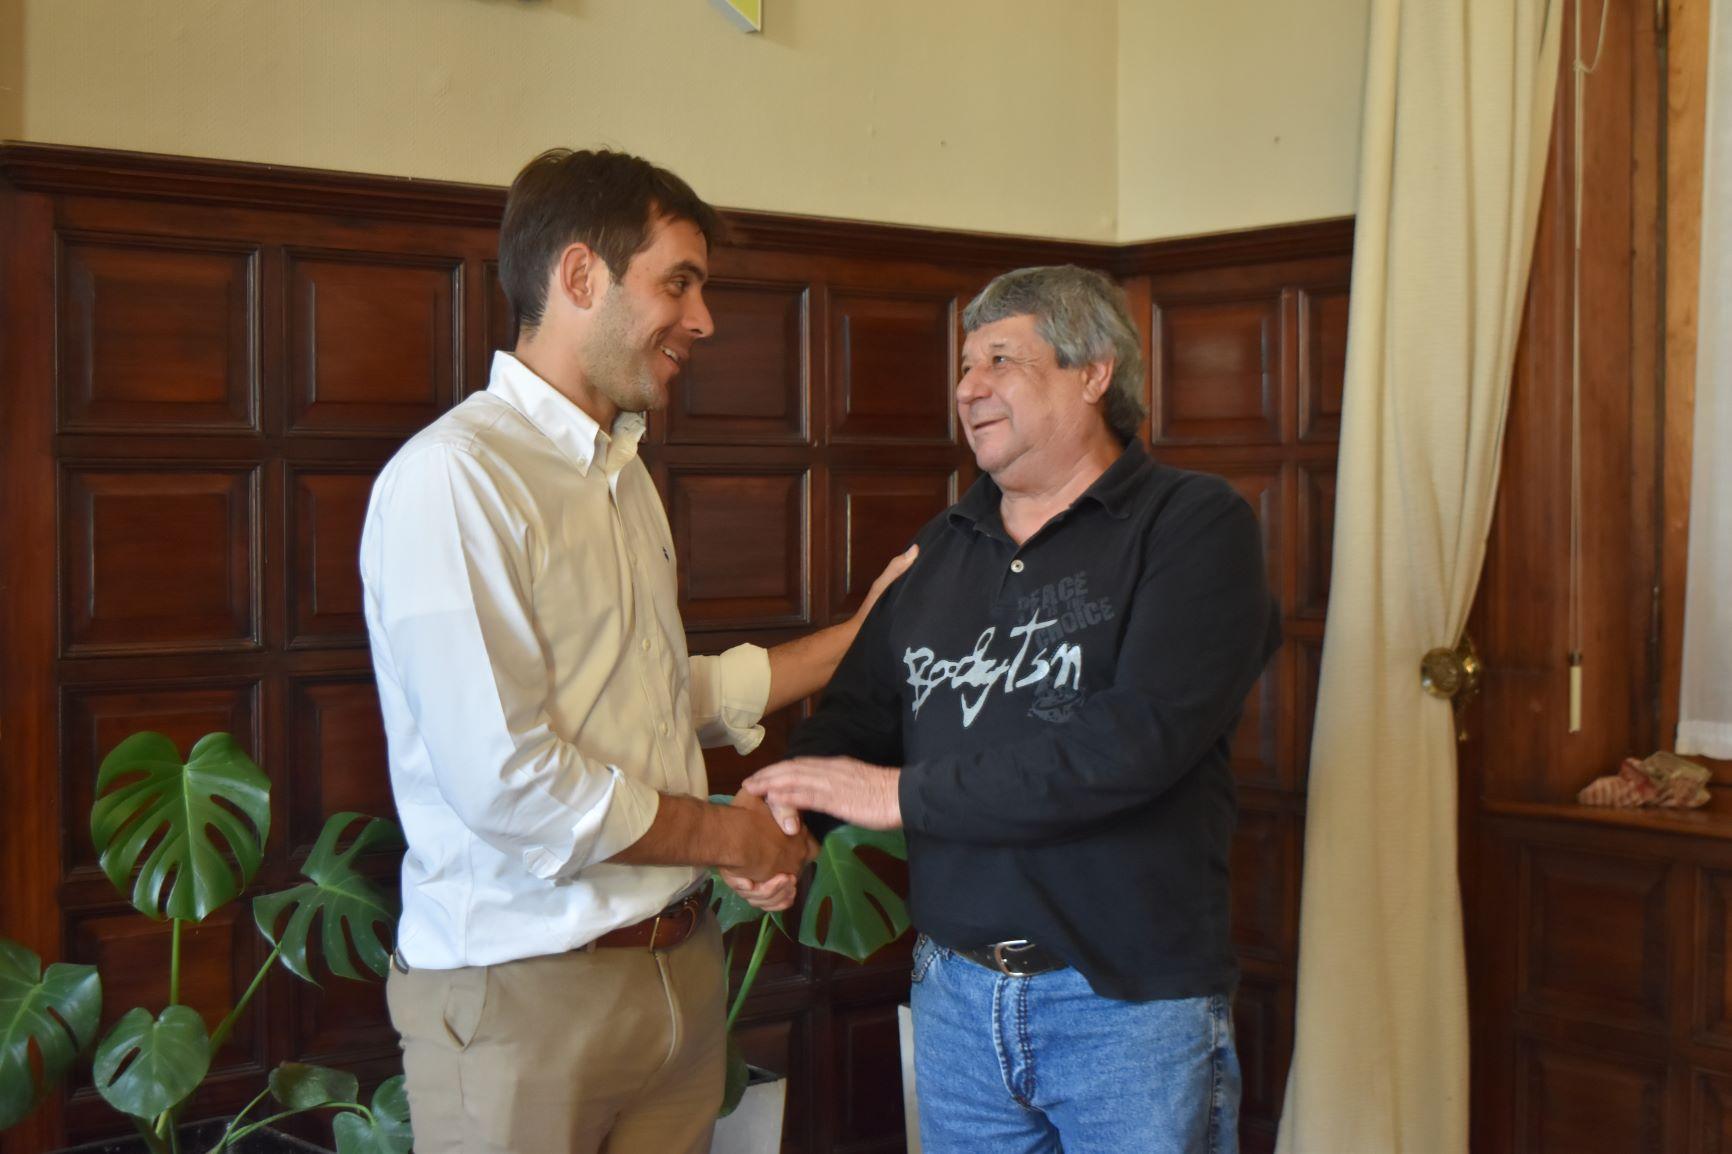 Passaglia anunció un bono de 12 mil pesos para los municipales de San Nicolás